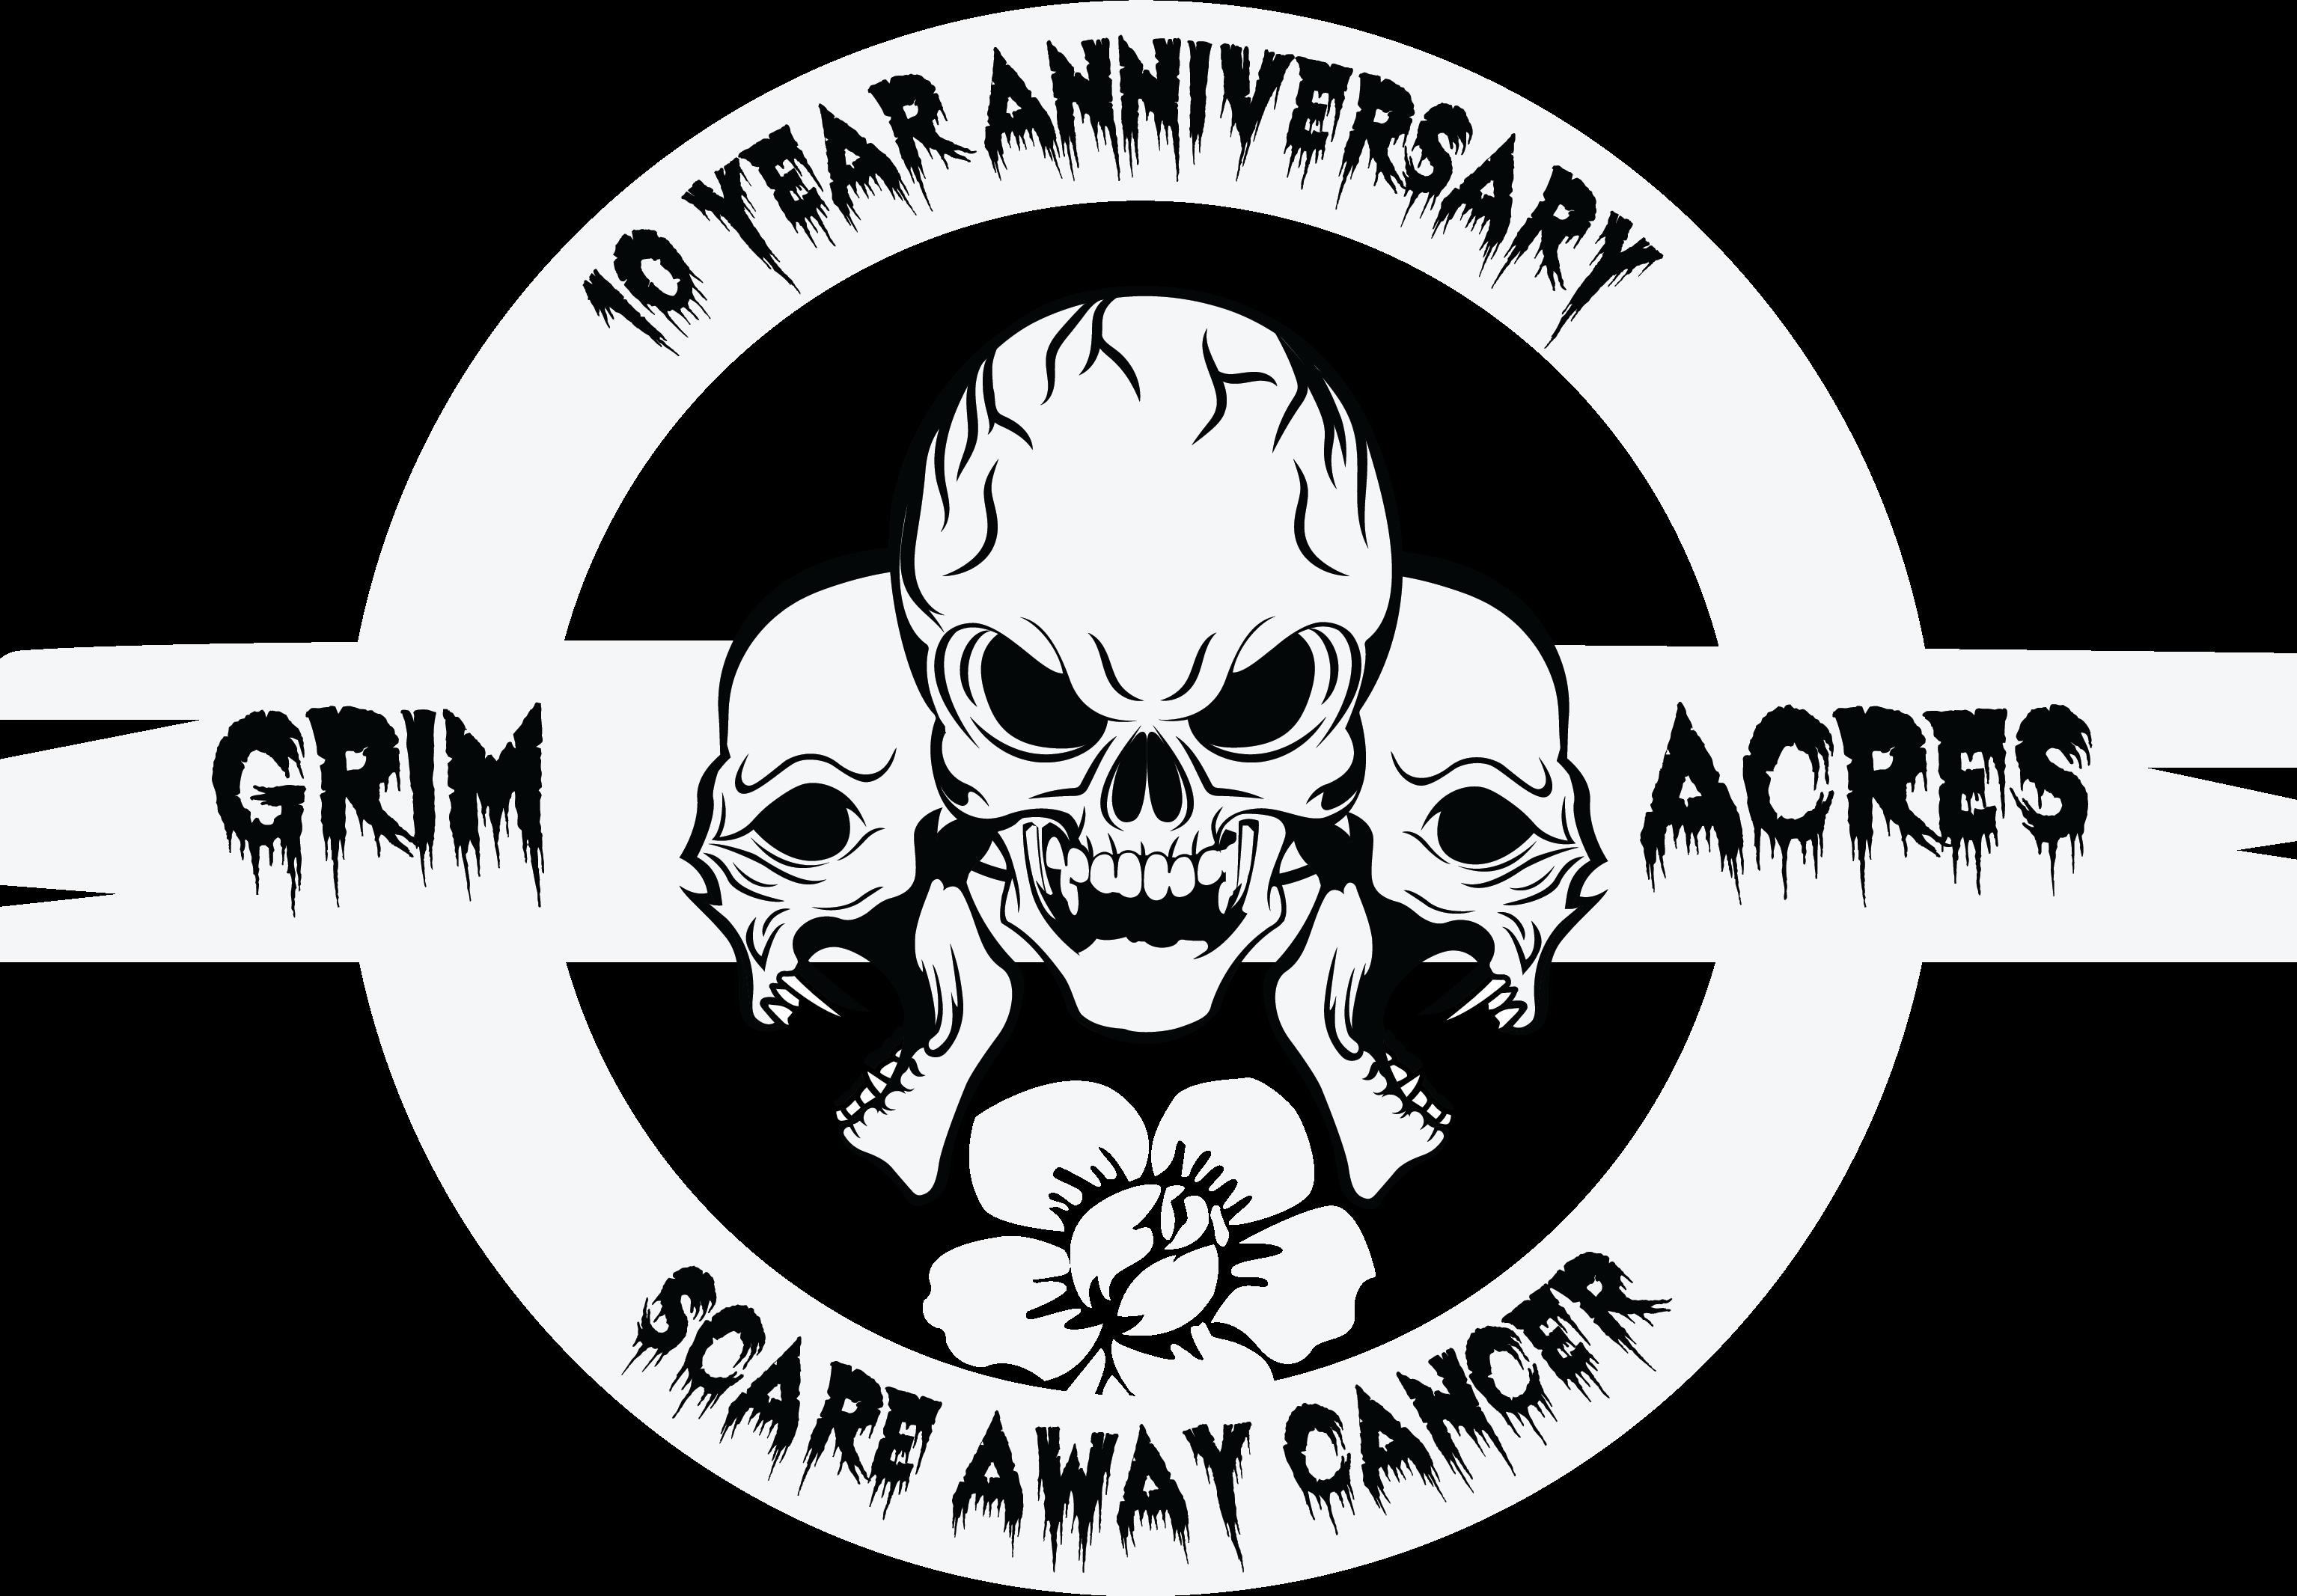 Grim Acres